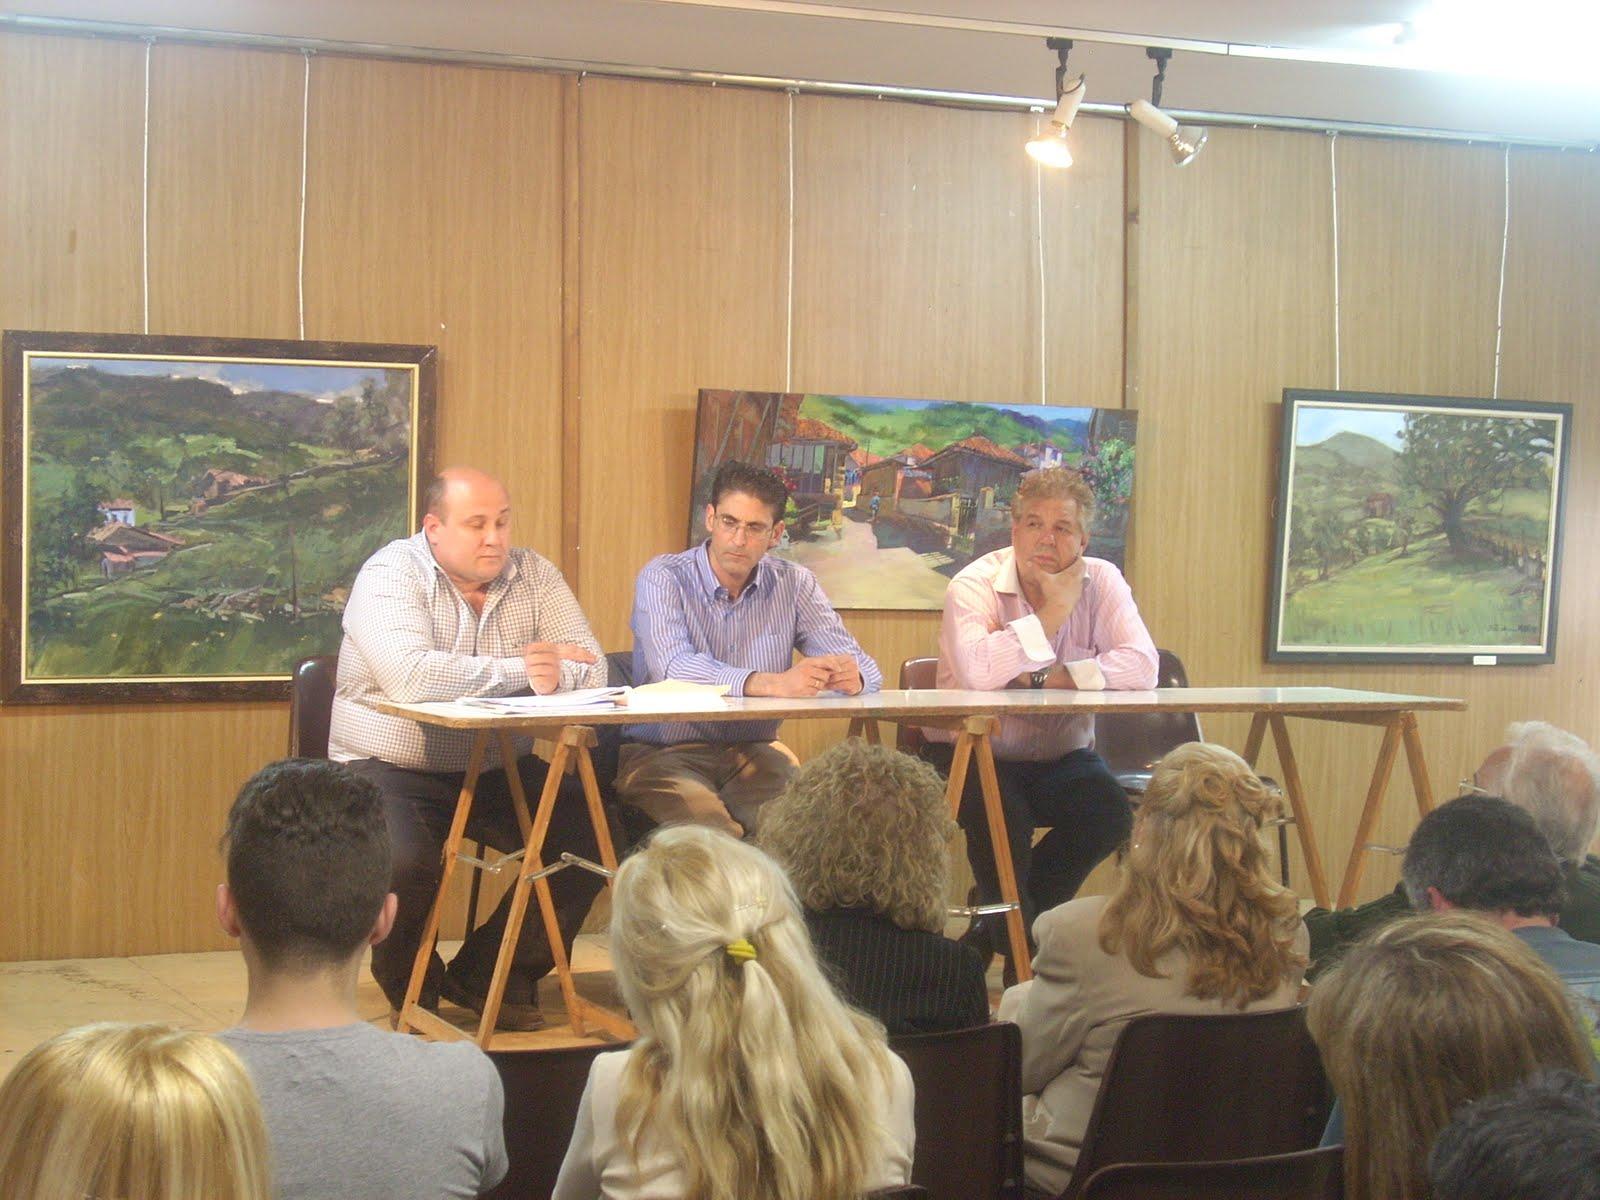 Foro asturias lena reuni n con asociaciones de campomanes for Foro chimeneas de lena